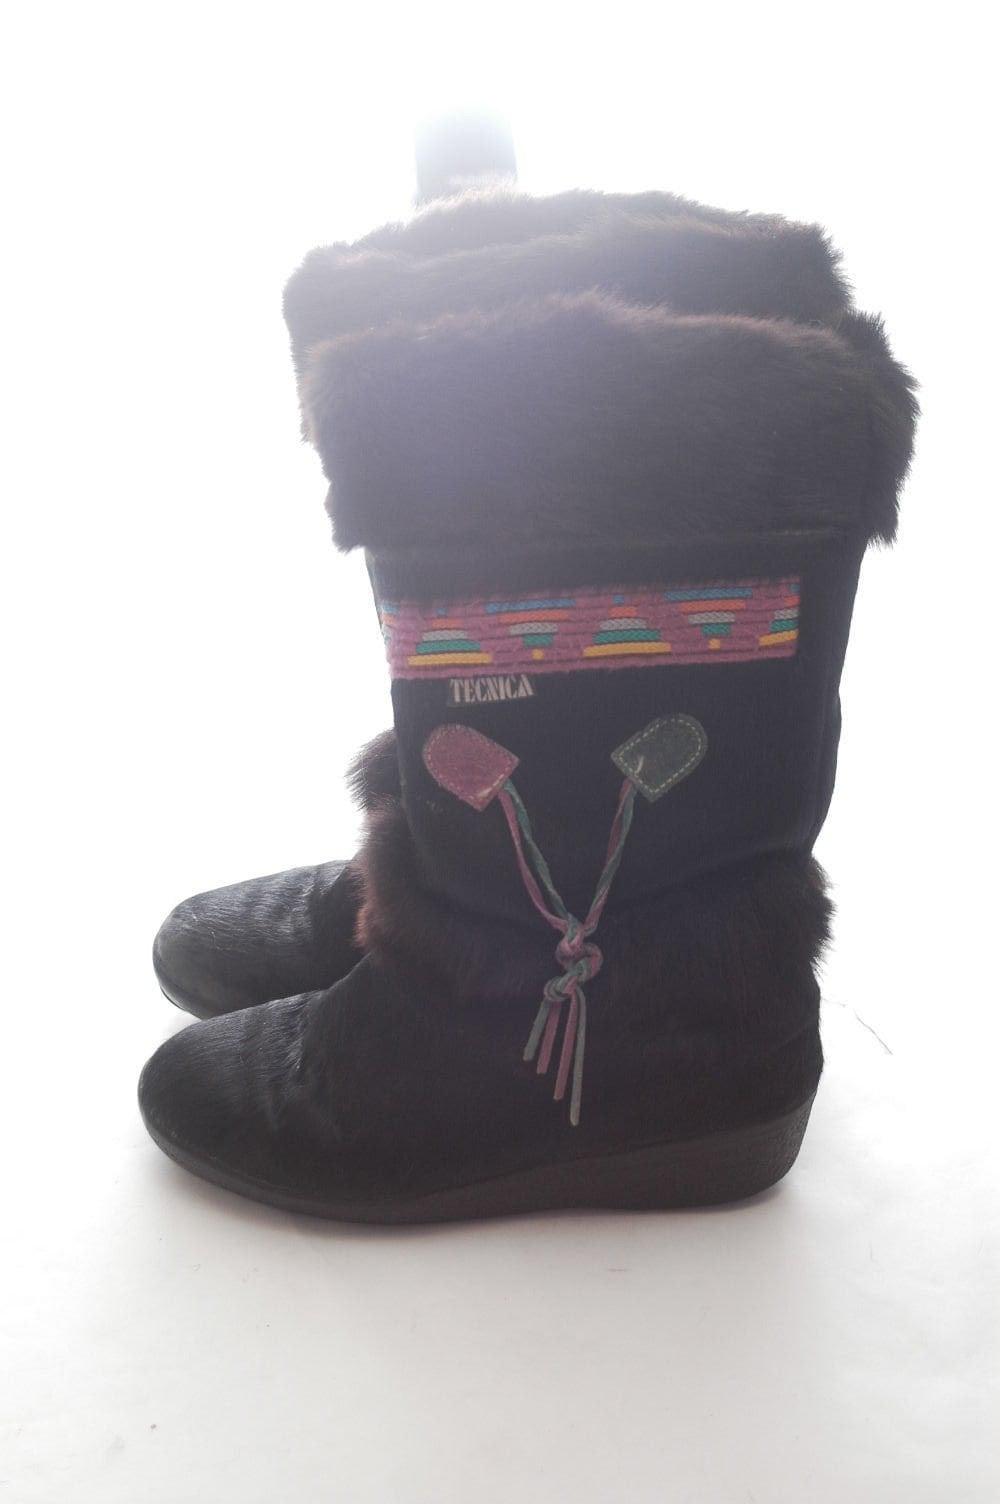 TECNICA 1990s 90s Snow Real Goat Fur Leather Snow 90s Apres Ski Boots Bohemian Boho Southwestern Aztec Winter Warm EU 38 US 7 7.5 Fur Shoes 67649f